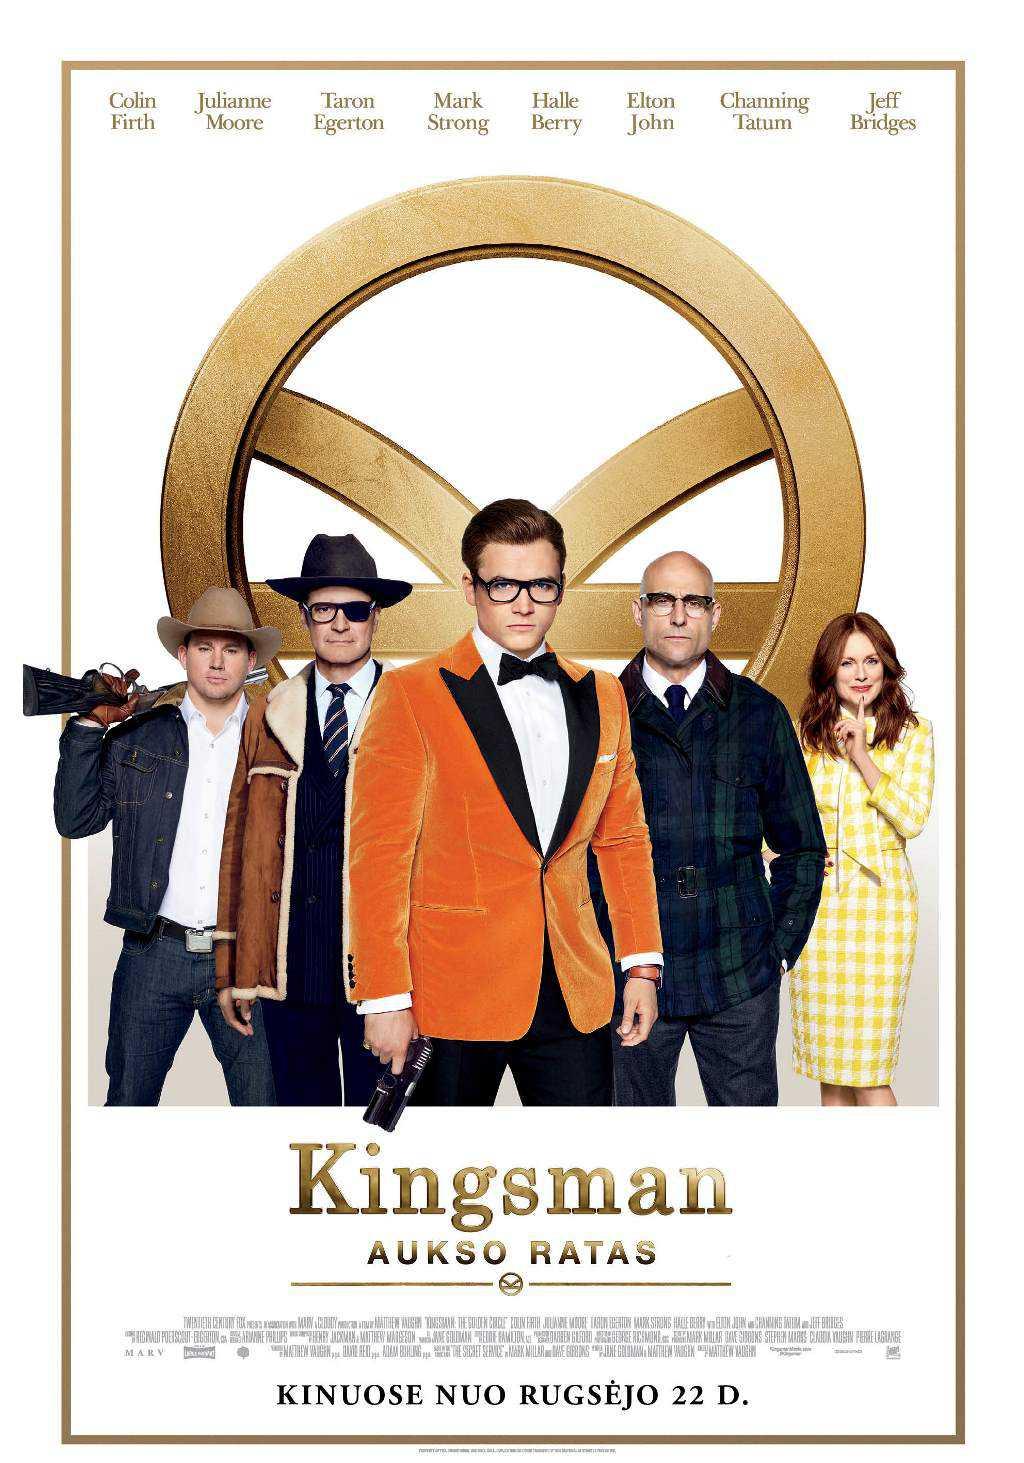 Kingsman. Aukso ratas (Kingsman. The Golden Circle)